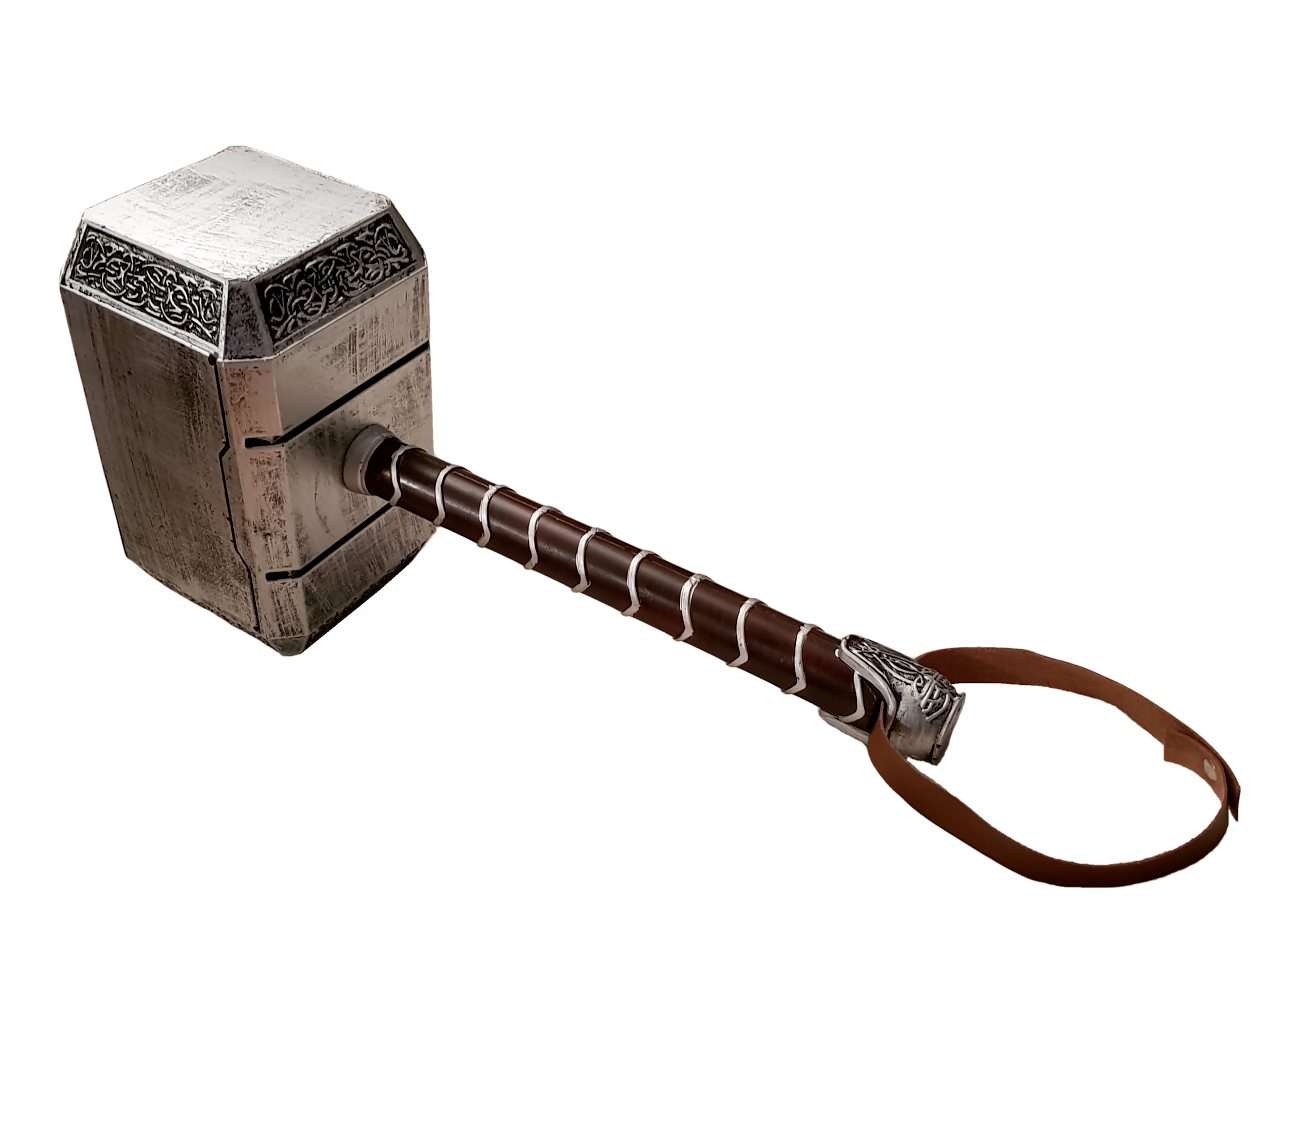 1:1 Thors Mjolnir Hammer SOFT FOAM Cosplay Fancy Dress SLIGHT SECONDS SALE 01